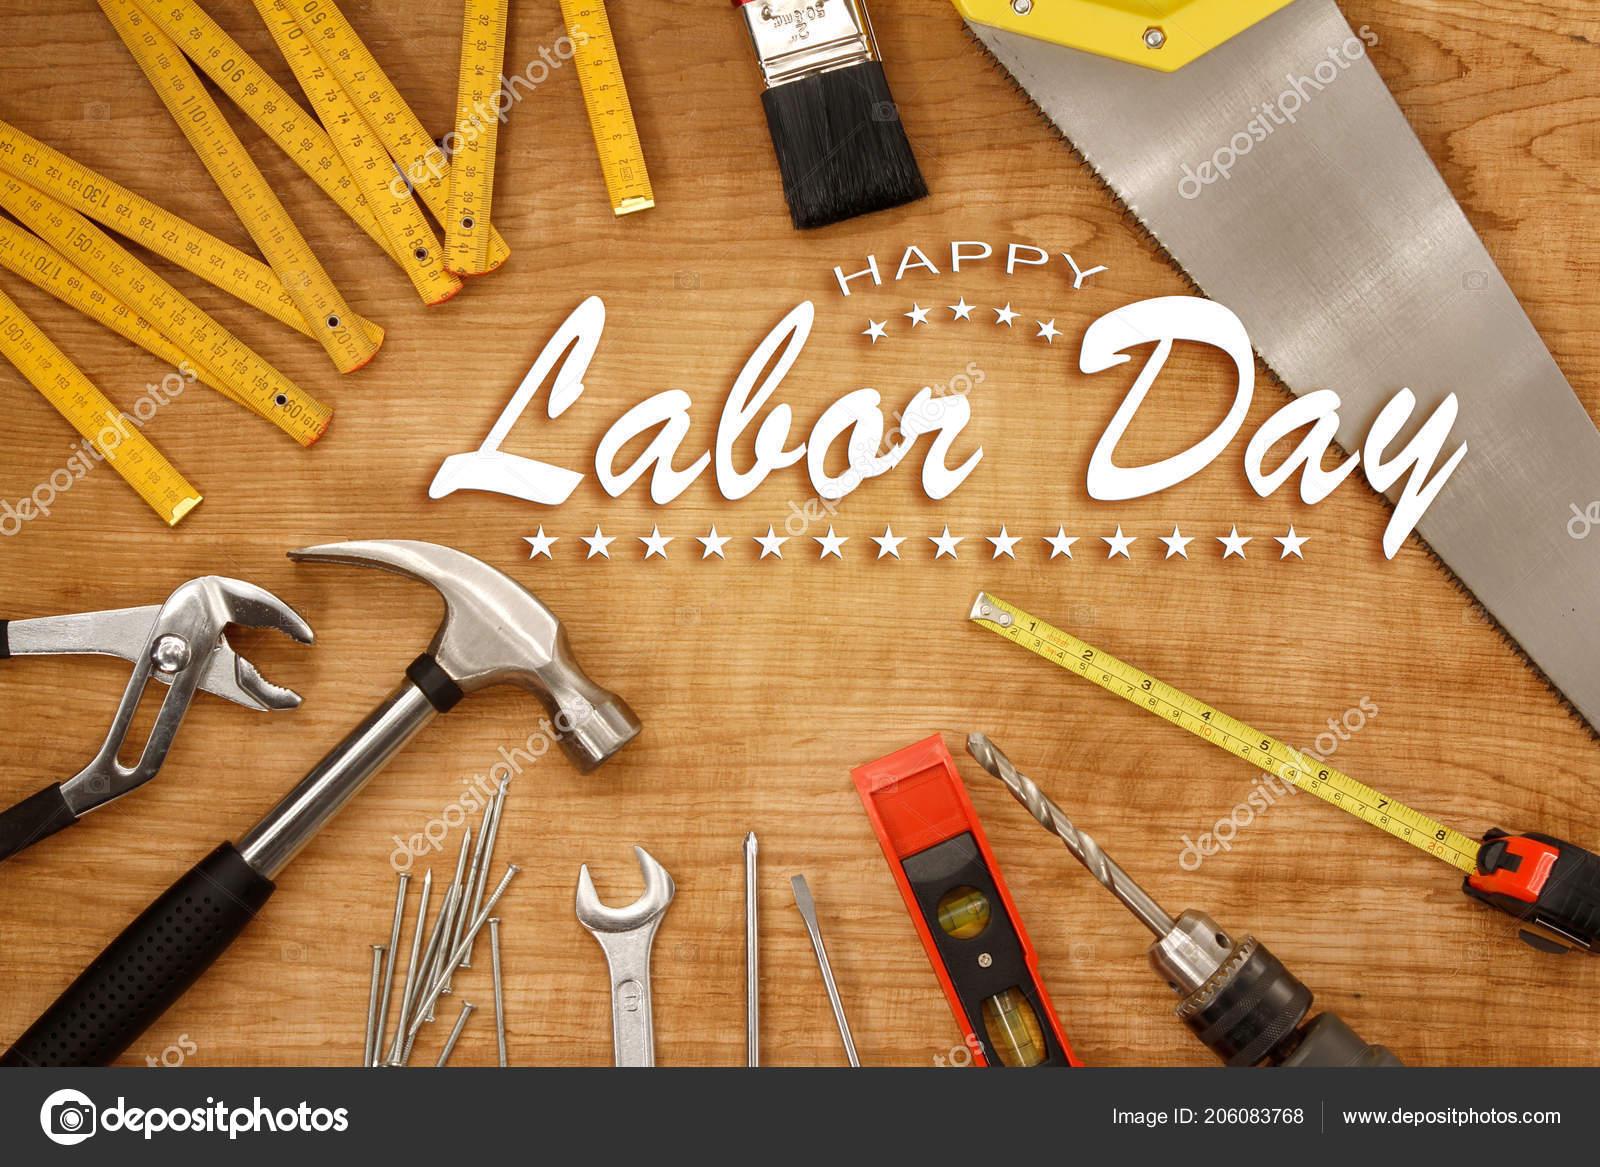 Happy Labor Day Tools Wood Stock Photo C Stillfx 206083768